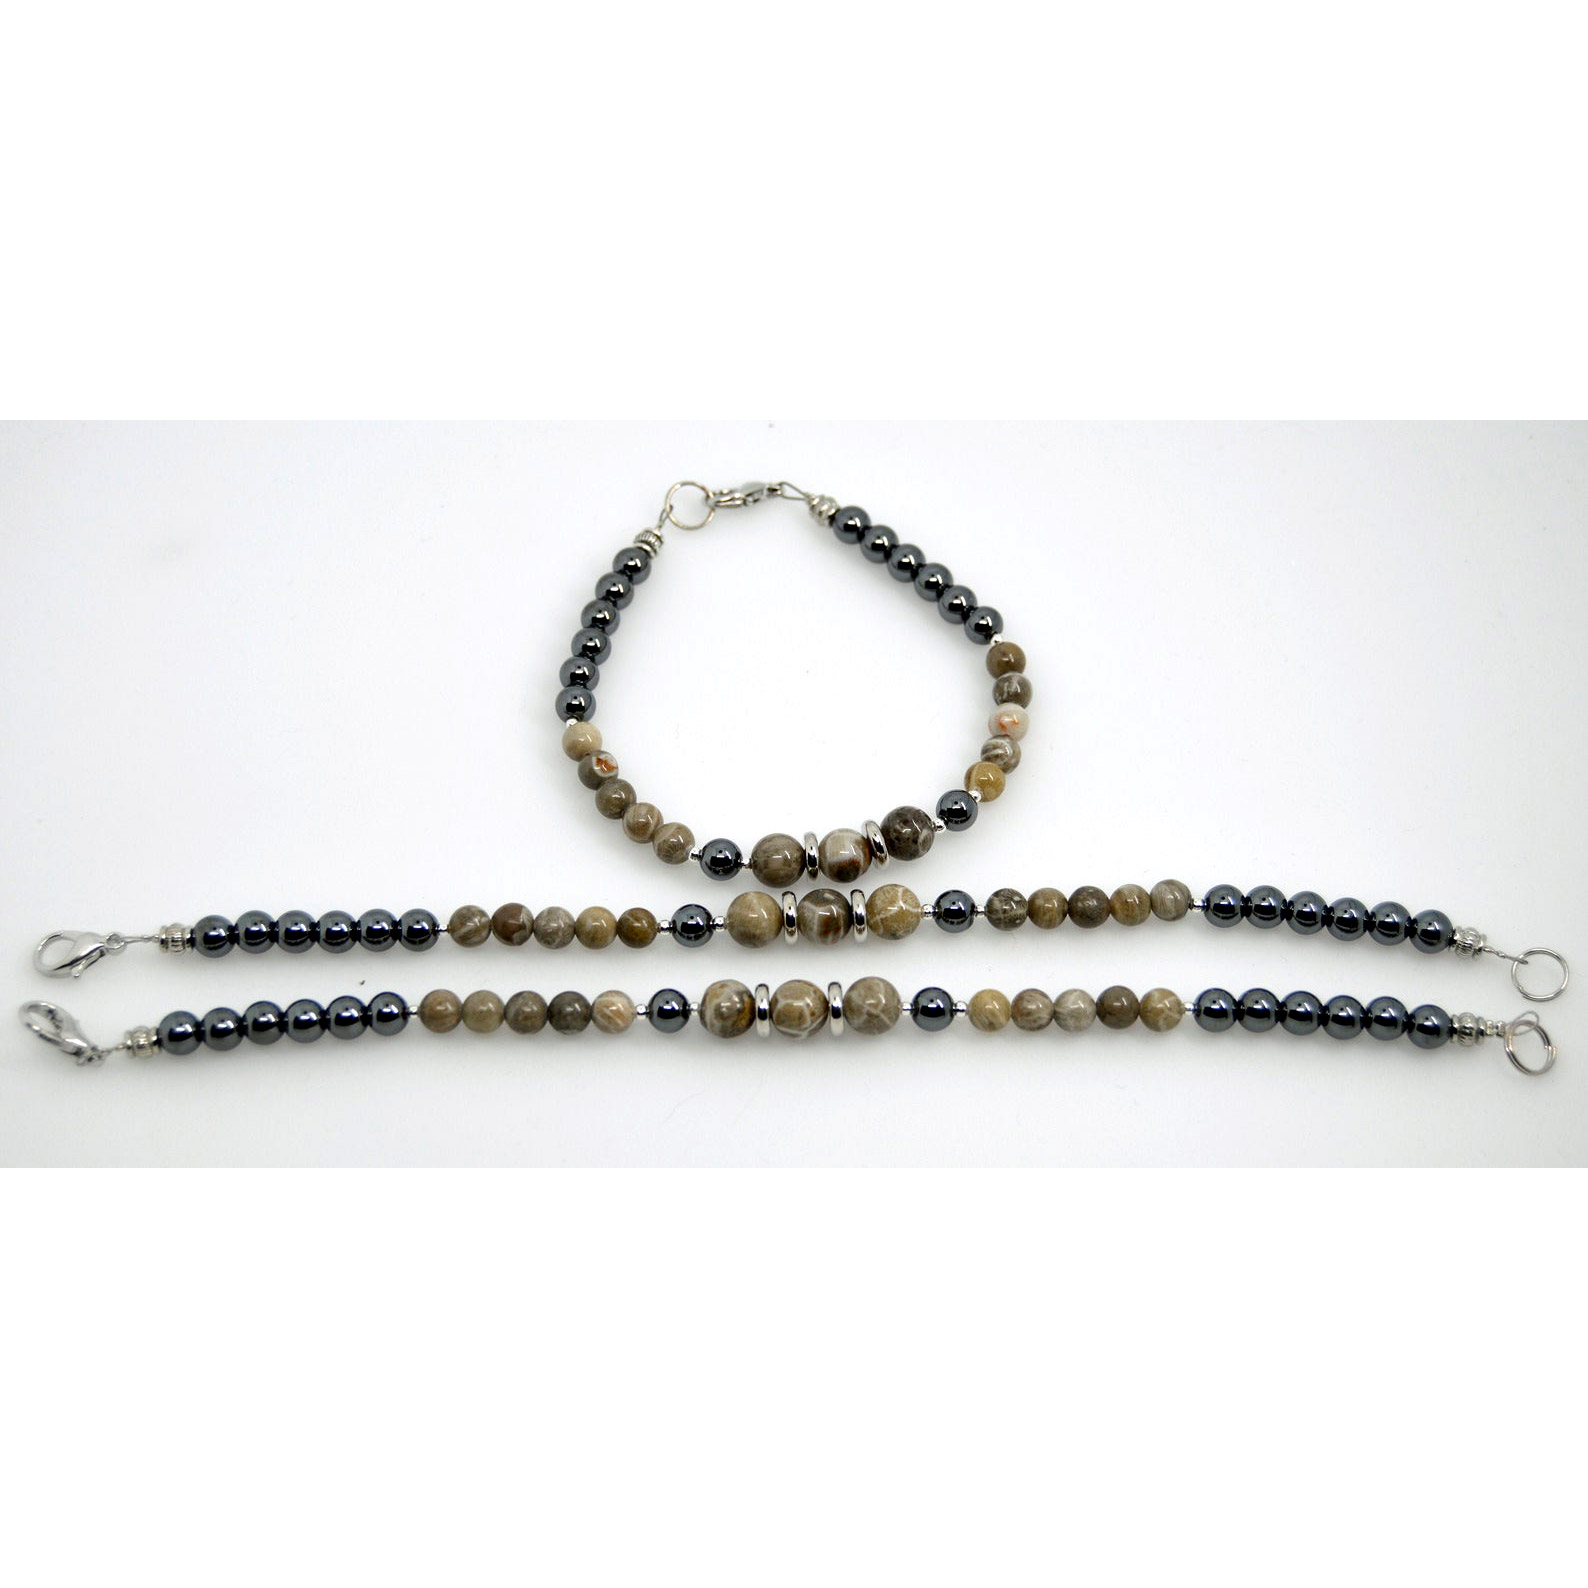 Petoskey Stone and Hematite Bracelets